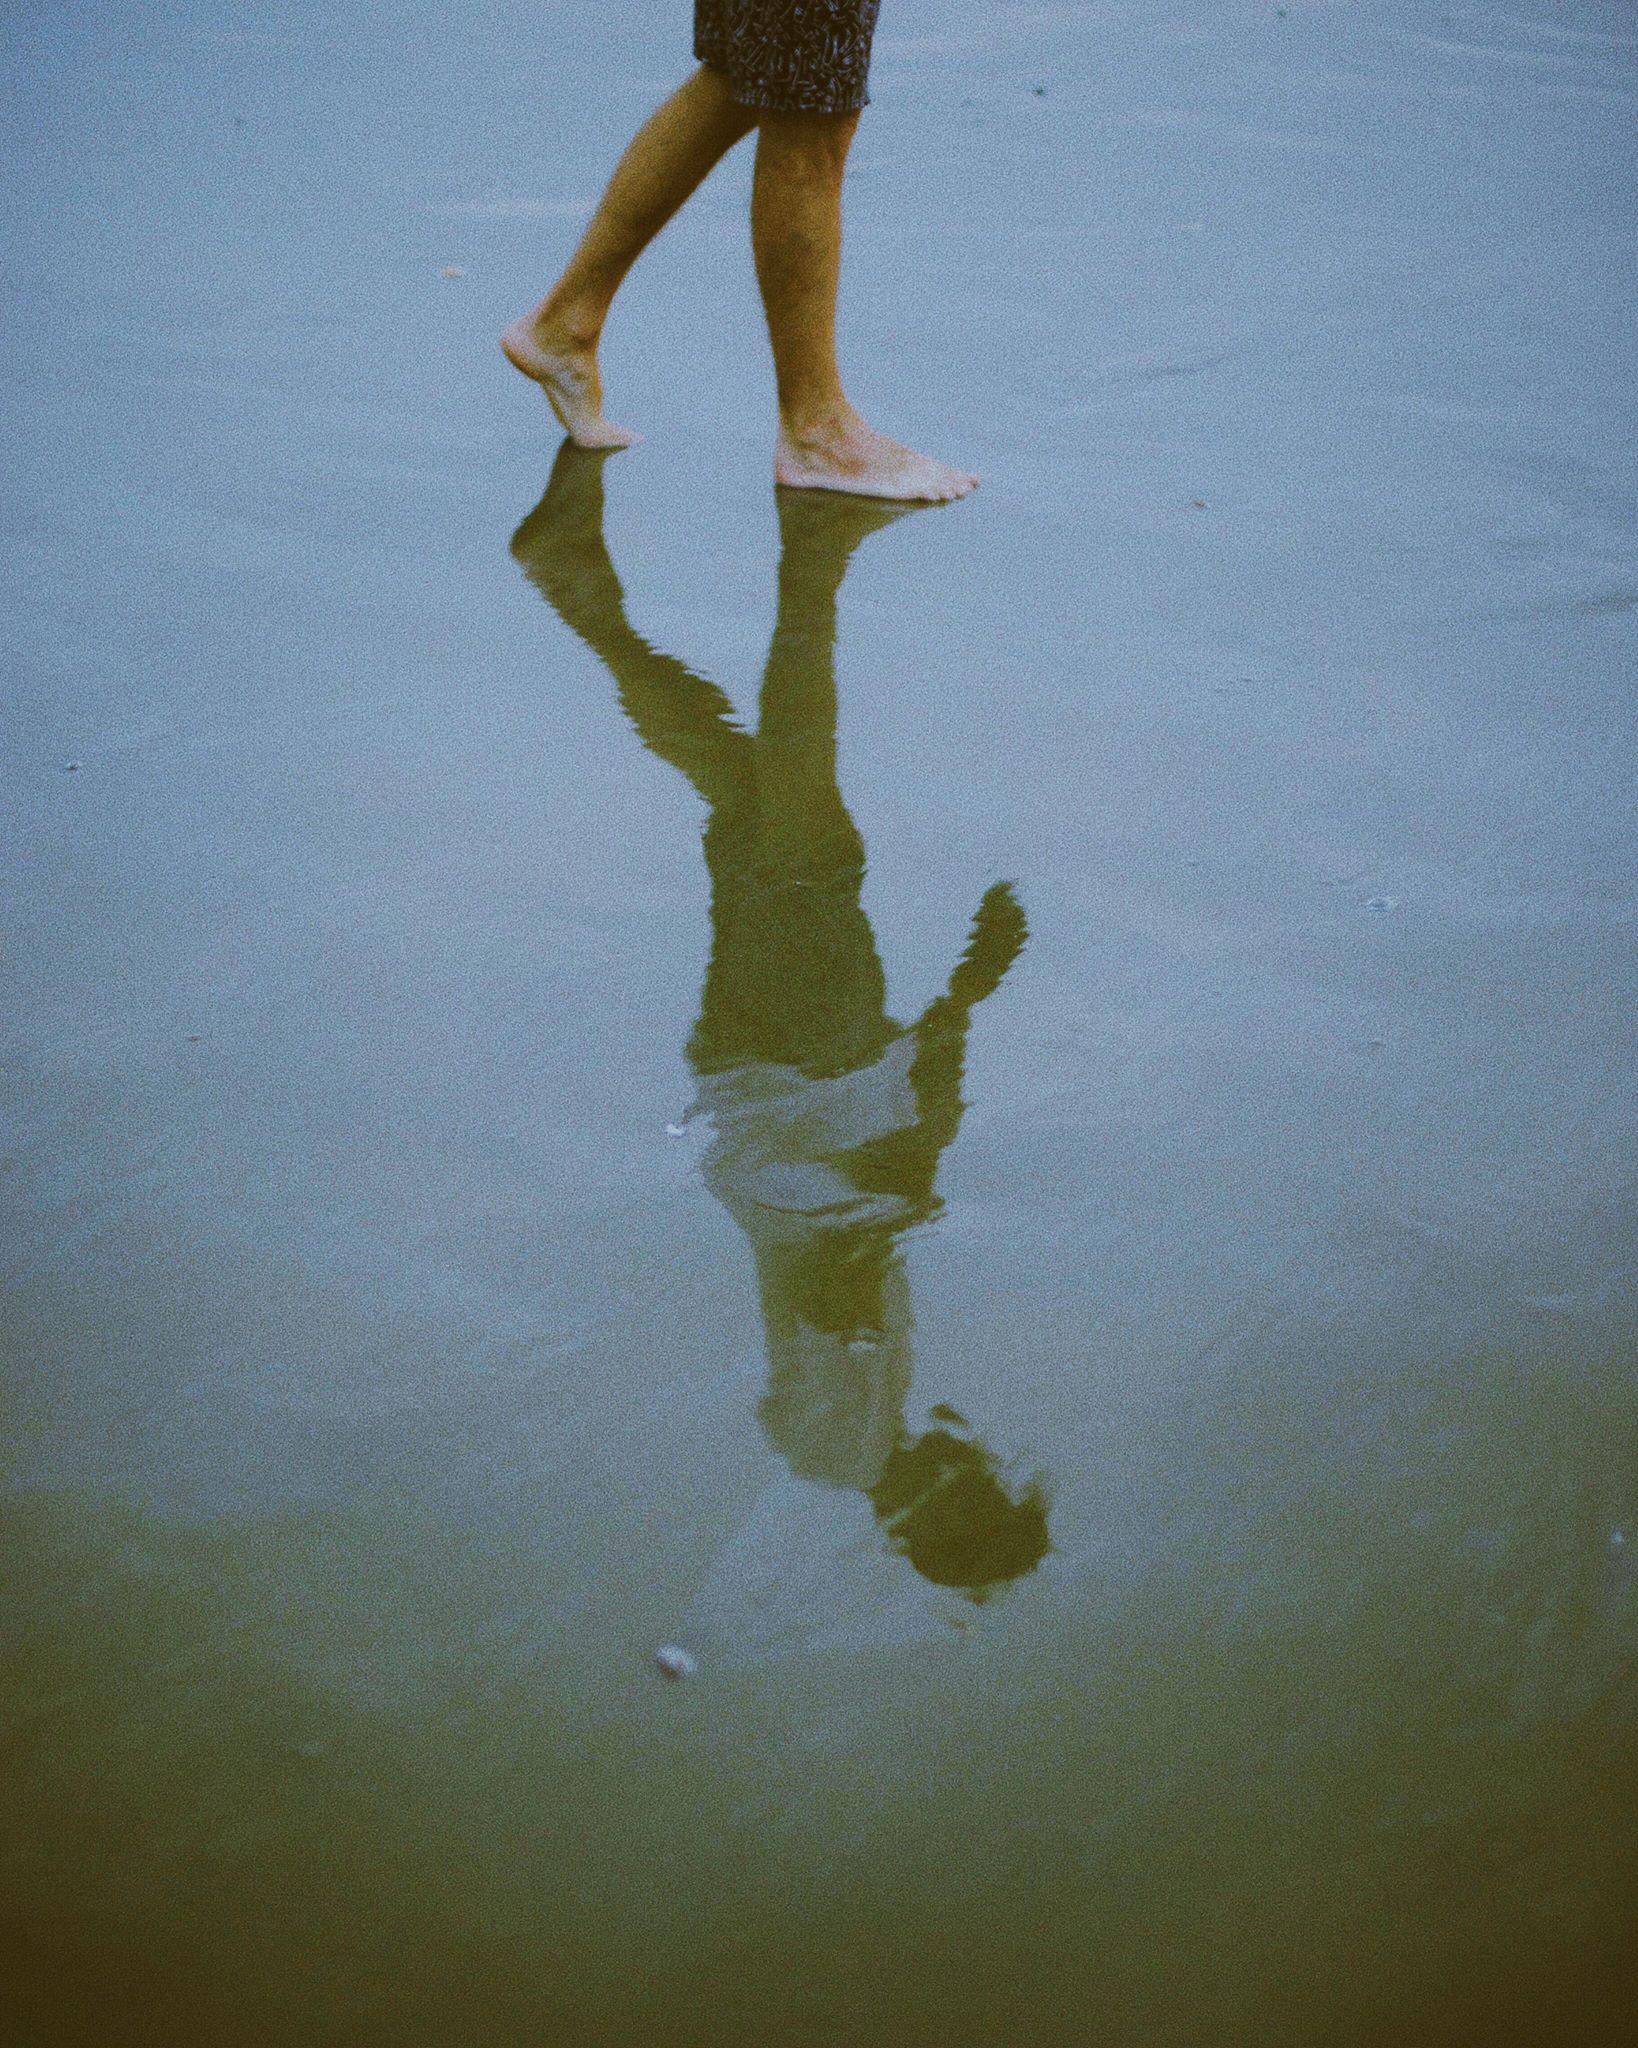 Pieds reflet marche